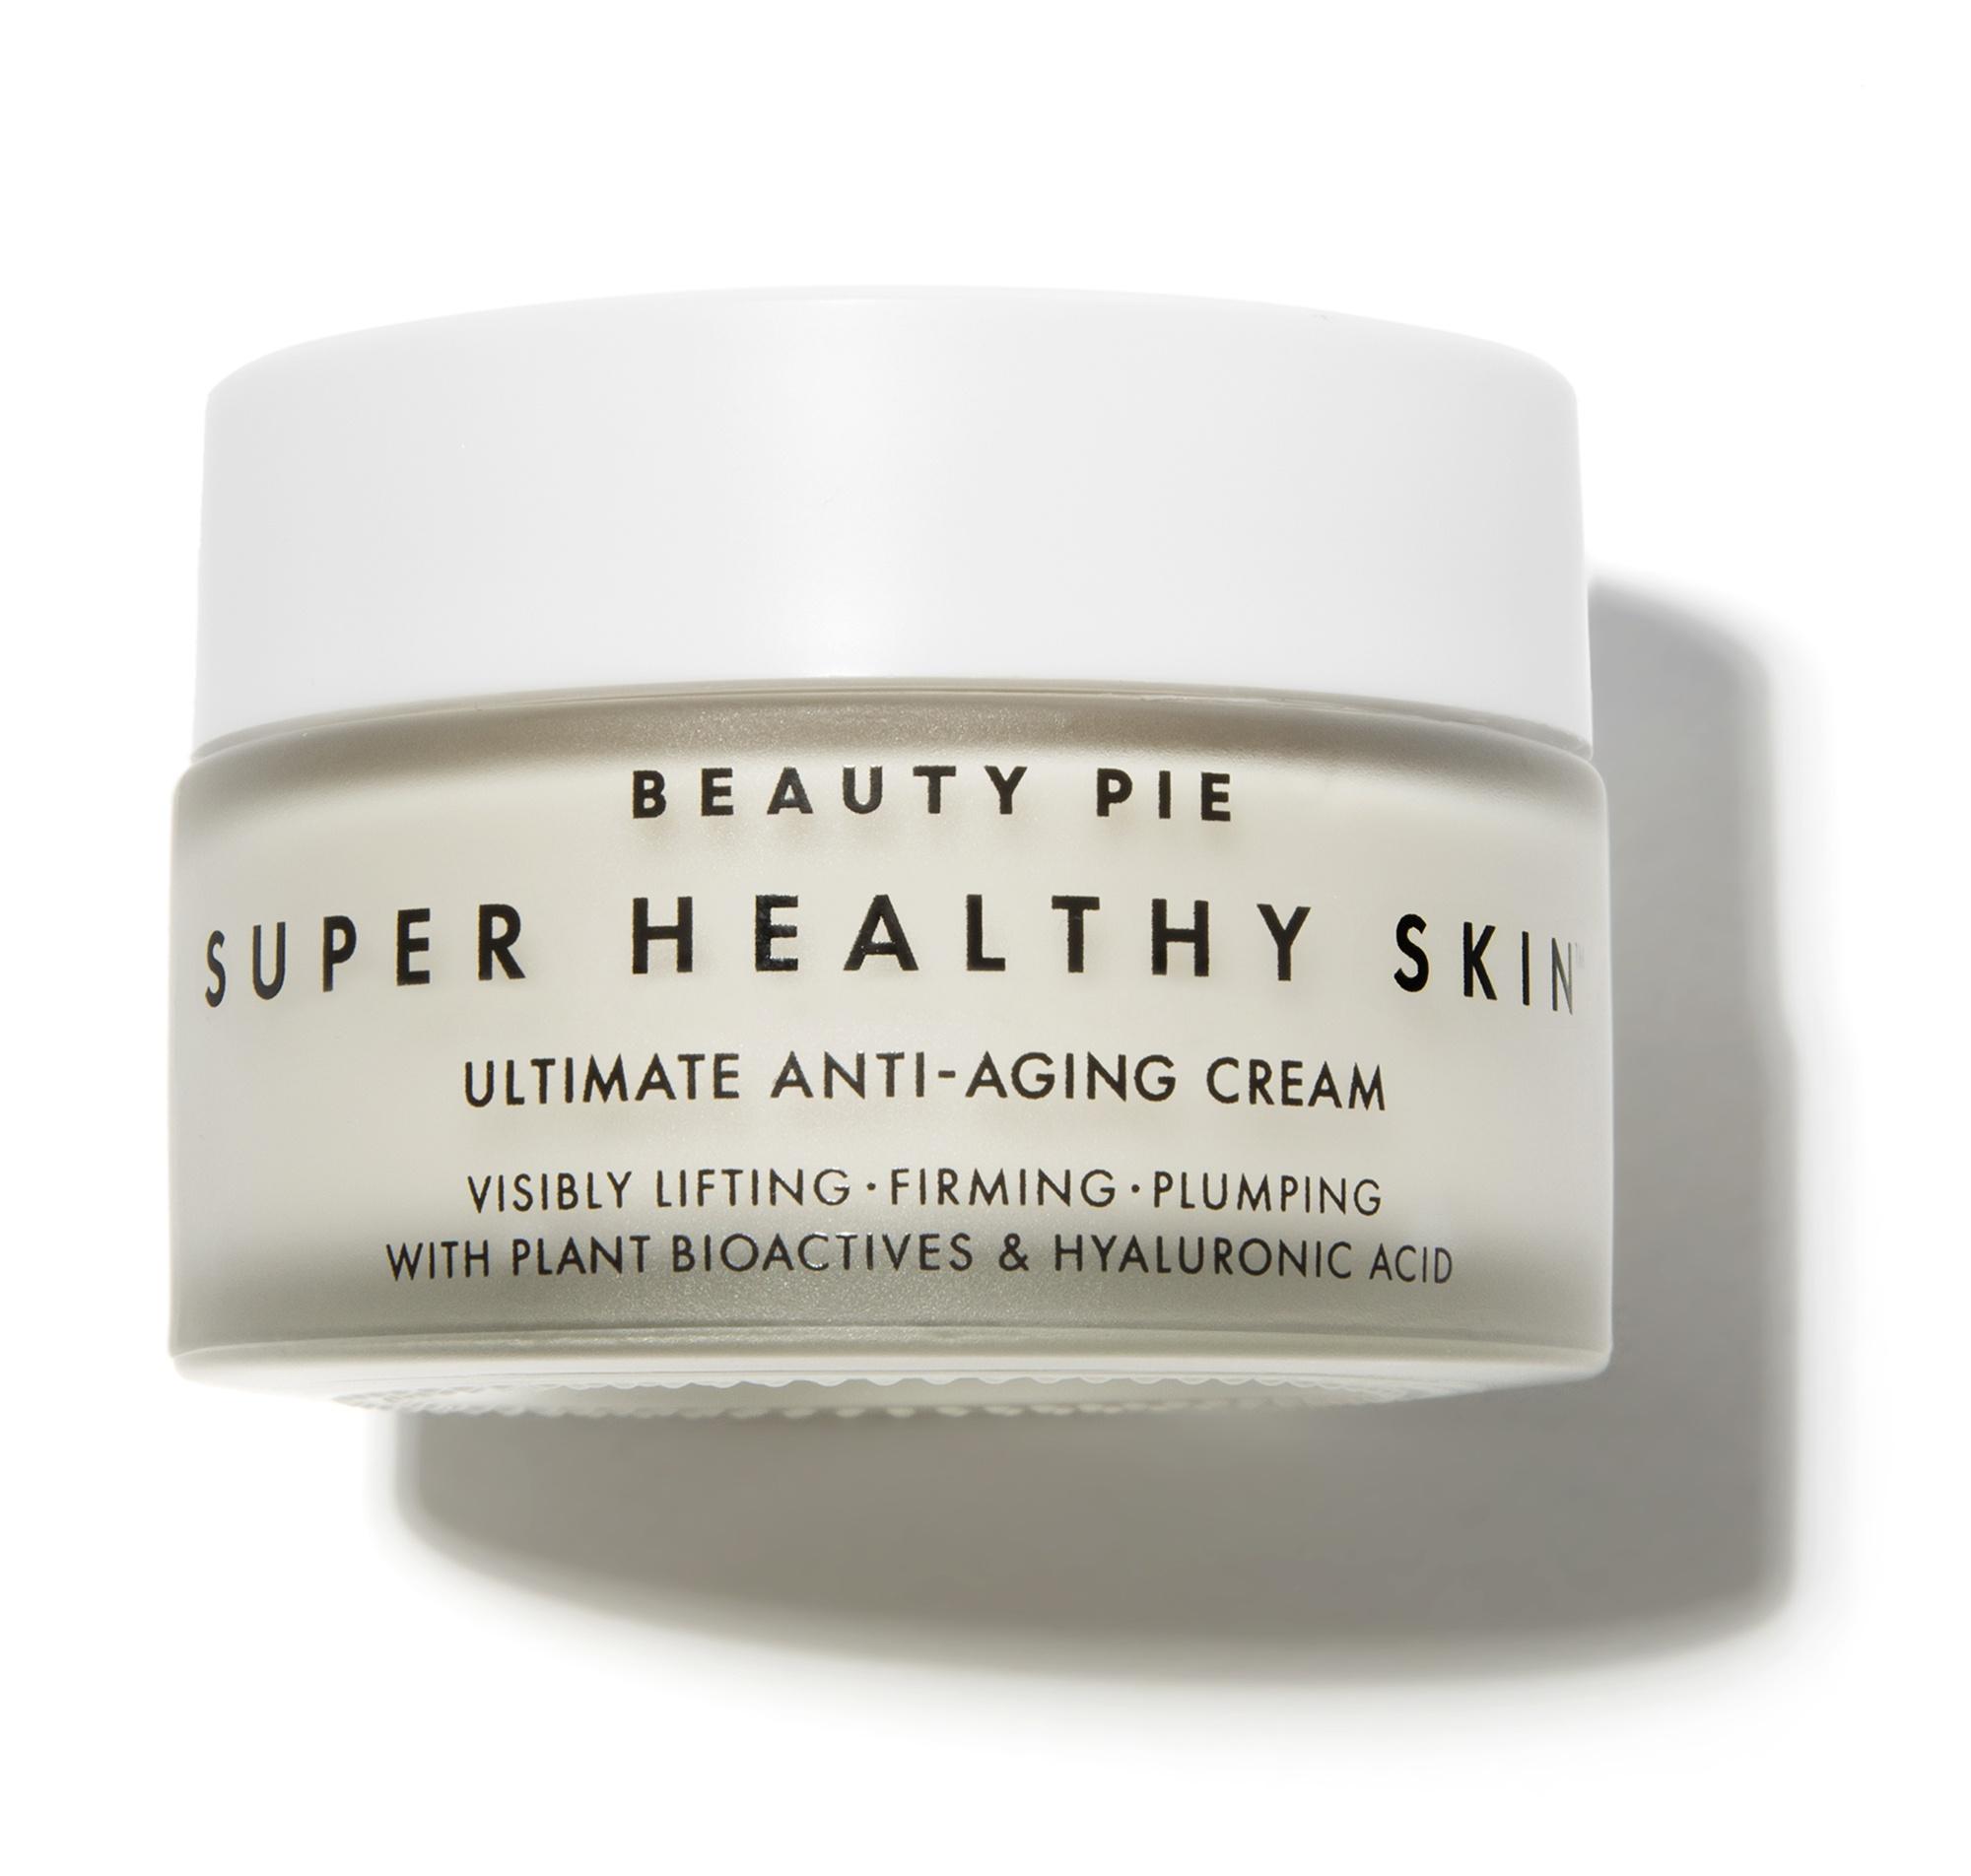 Beauty Pie Super Healthy Skin™ Ultimate Anti-Aging Cream